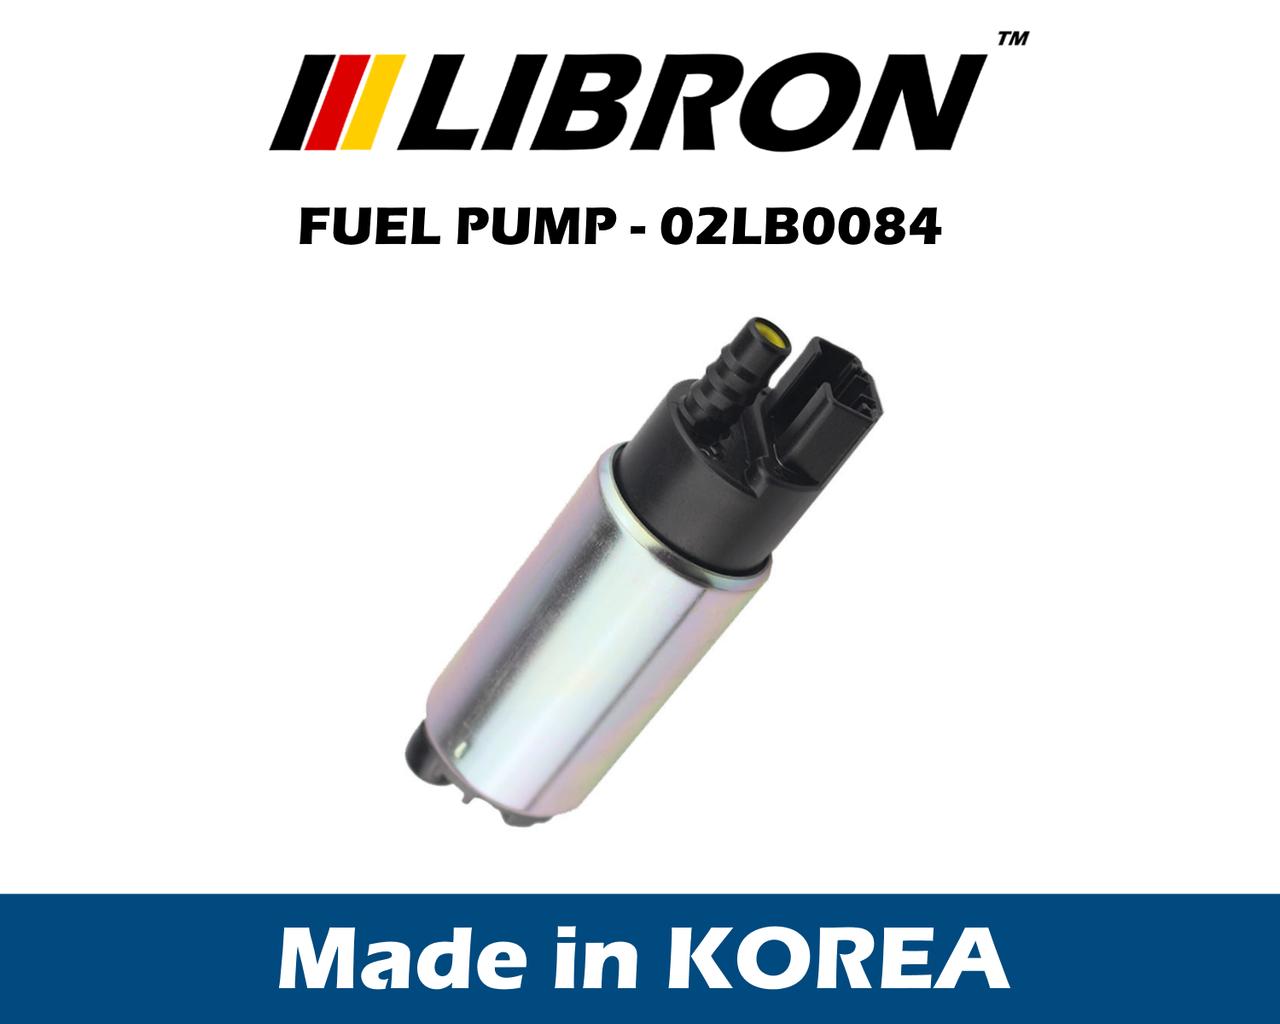 Бензонасос LIBRON 02LB0084 - Мазда MX-5 I